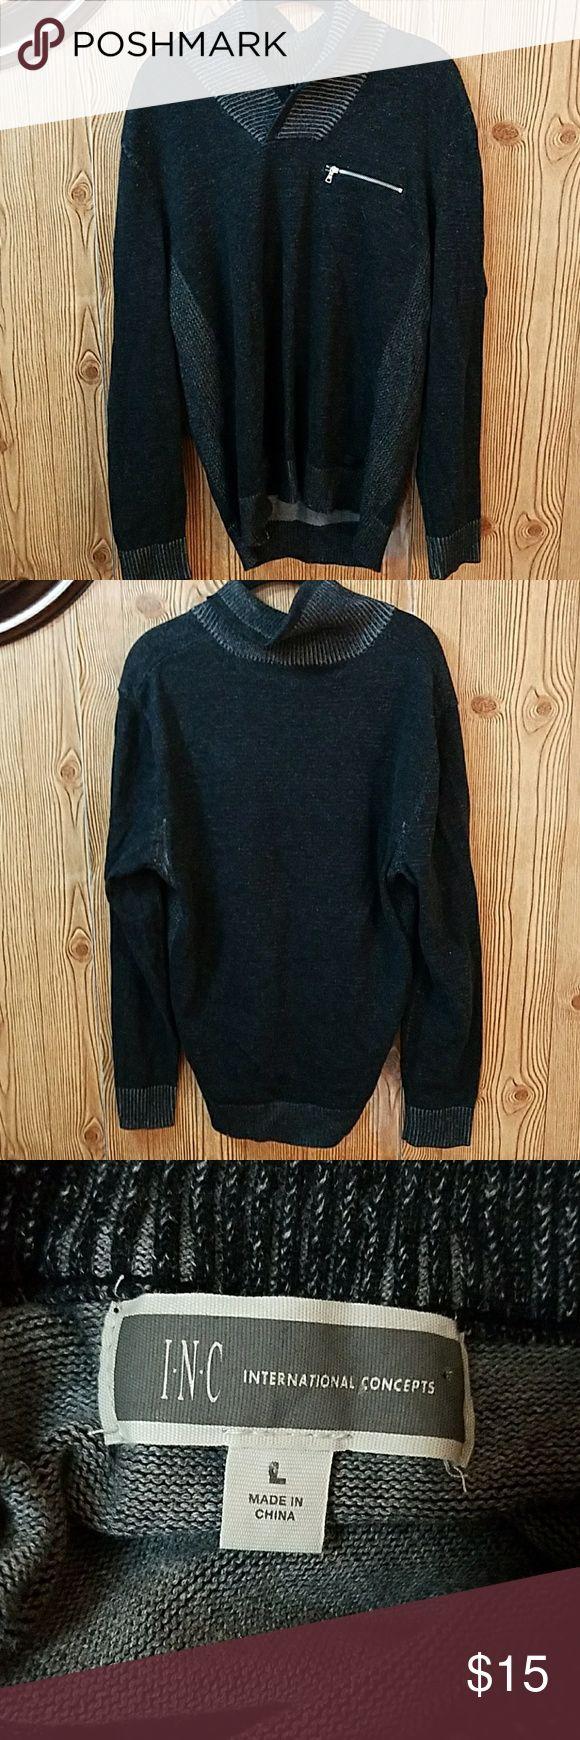 ?INC International Concepts Sweater? Gray INC International Concepts Shawl Collar Sweater INC International Concepts Sweaters V-Neck